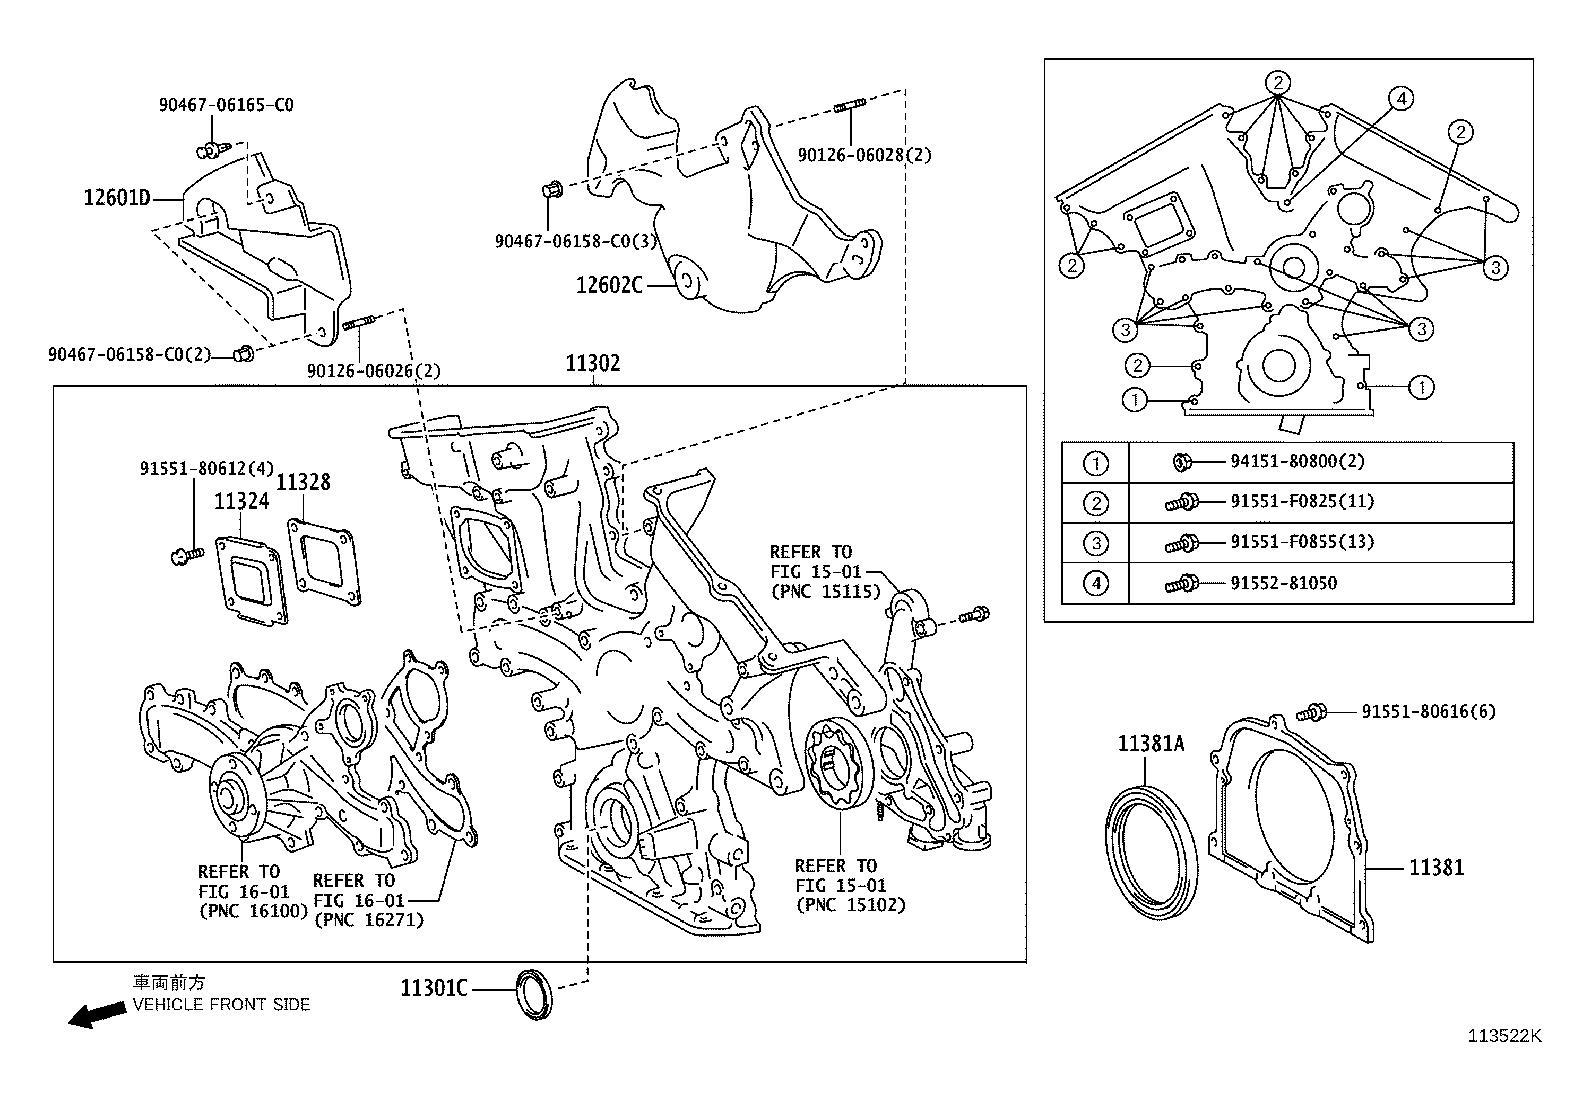 Lexus Gs 350 Engine Crankshaft Seal Seal Oil For Timing